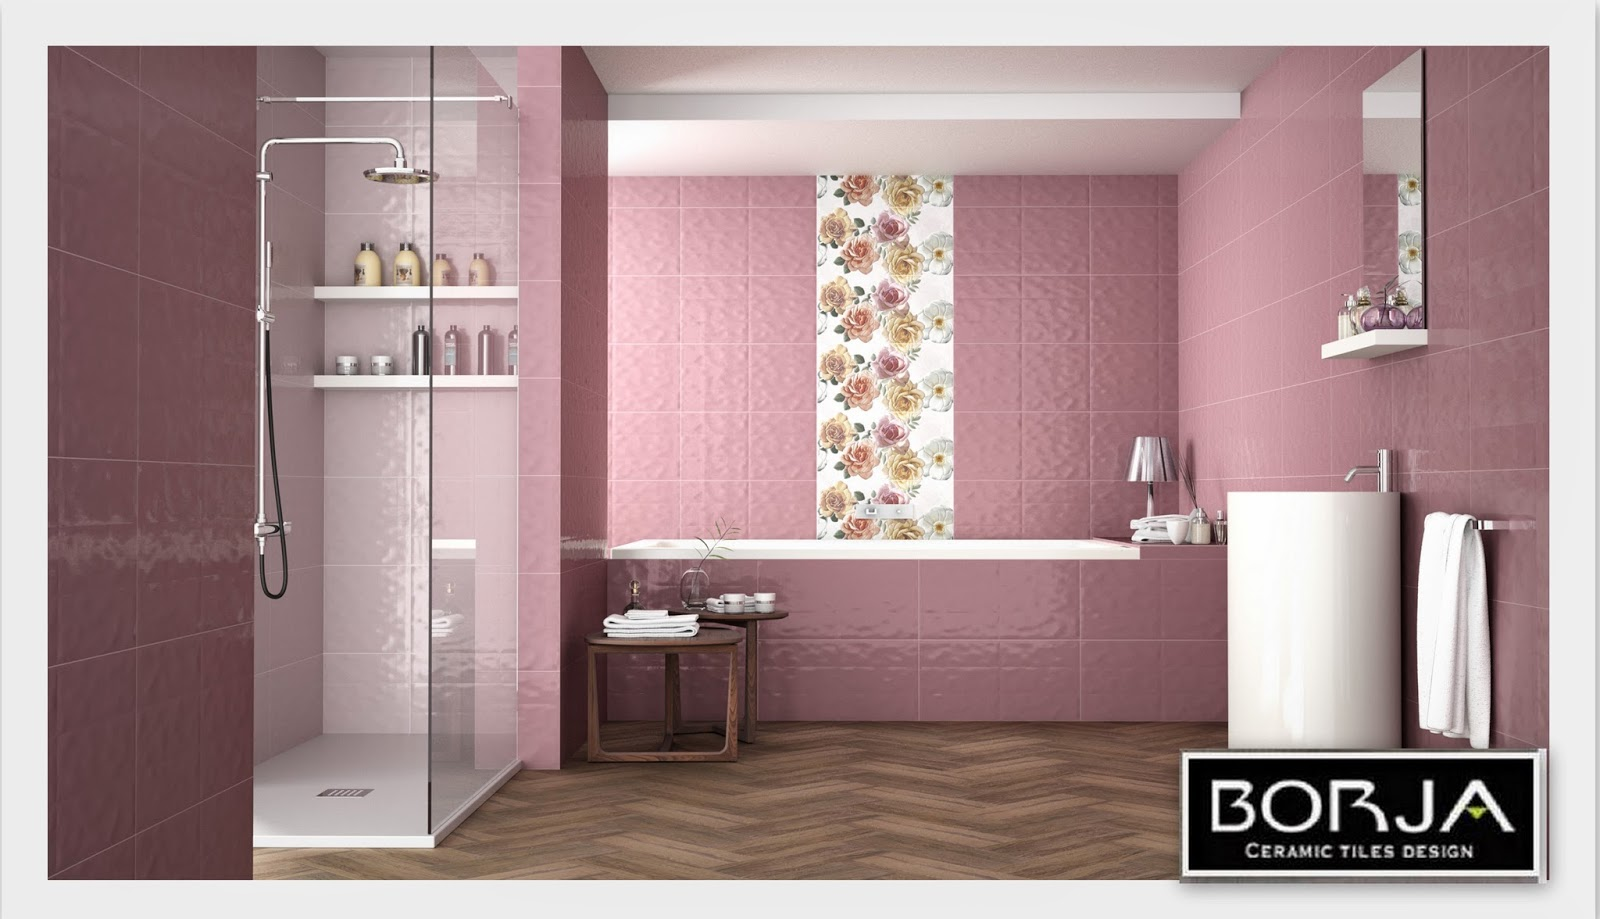 Borja ceramic tiles design combination decor bristol 30x60 and langley white 30x60 doublecrazyfo Image collections